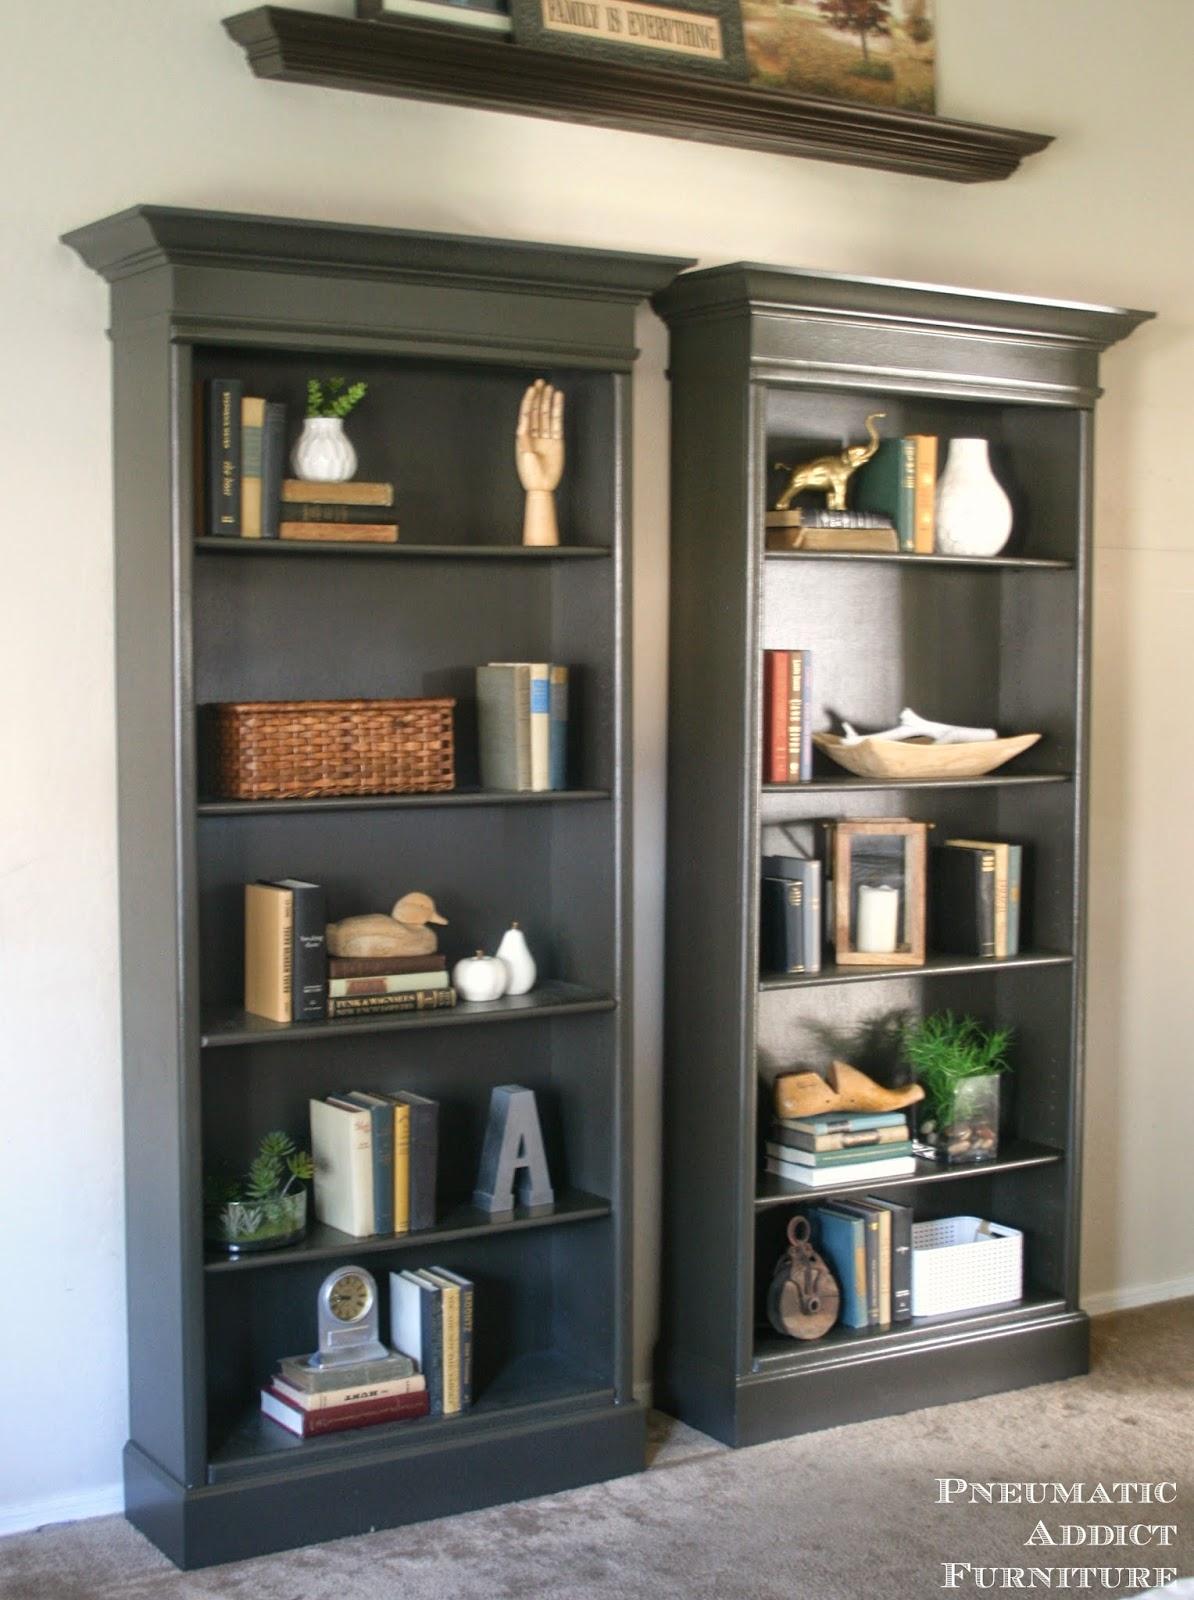 How To Upgrade Bookshelves  Pneumatic Addict